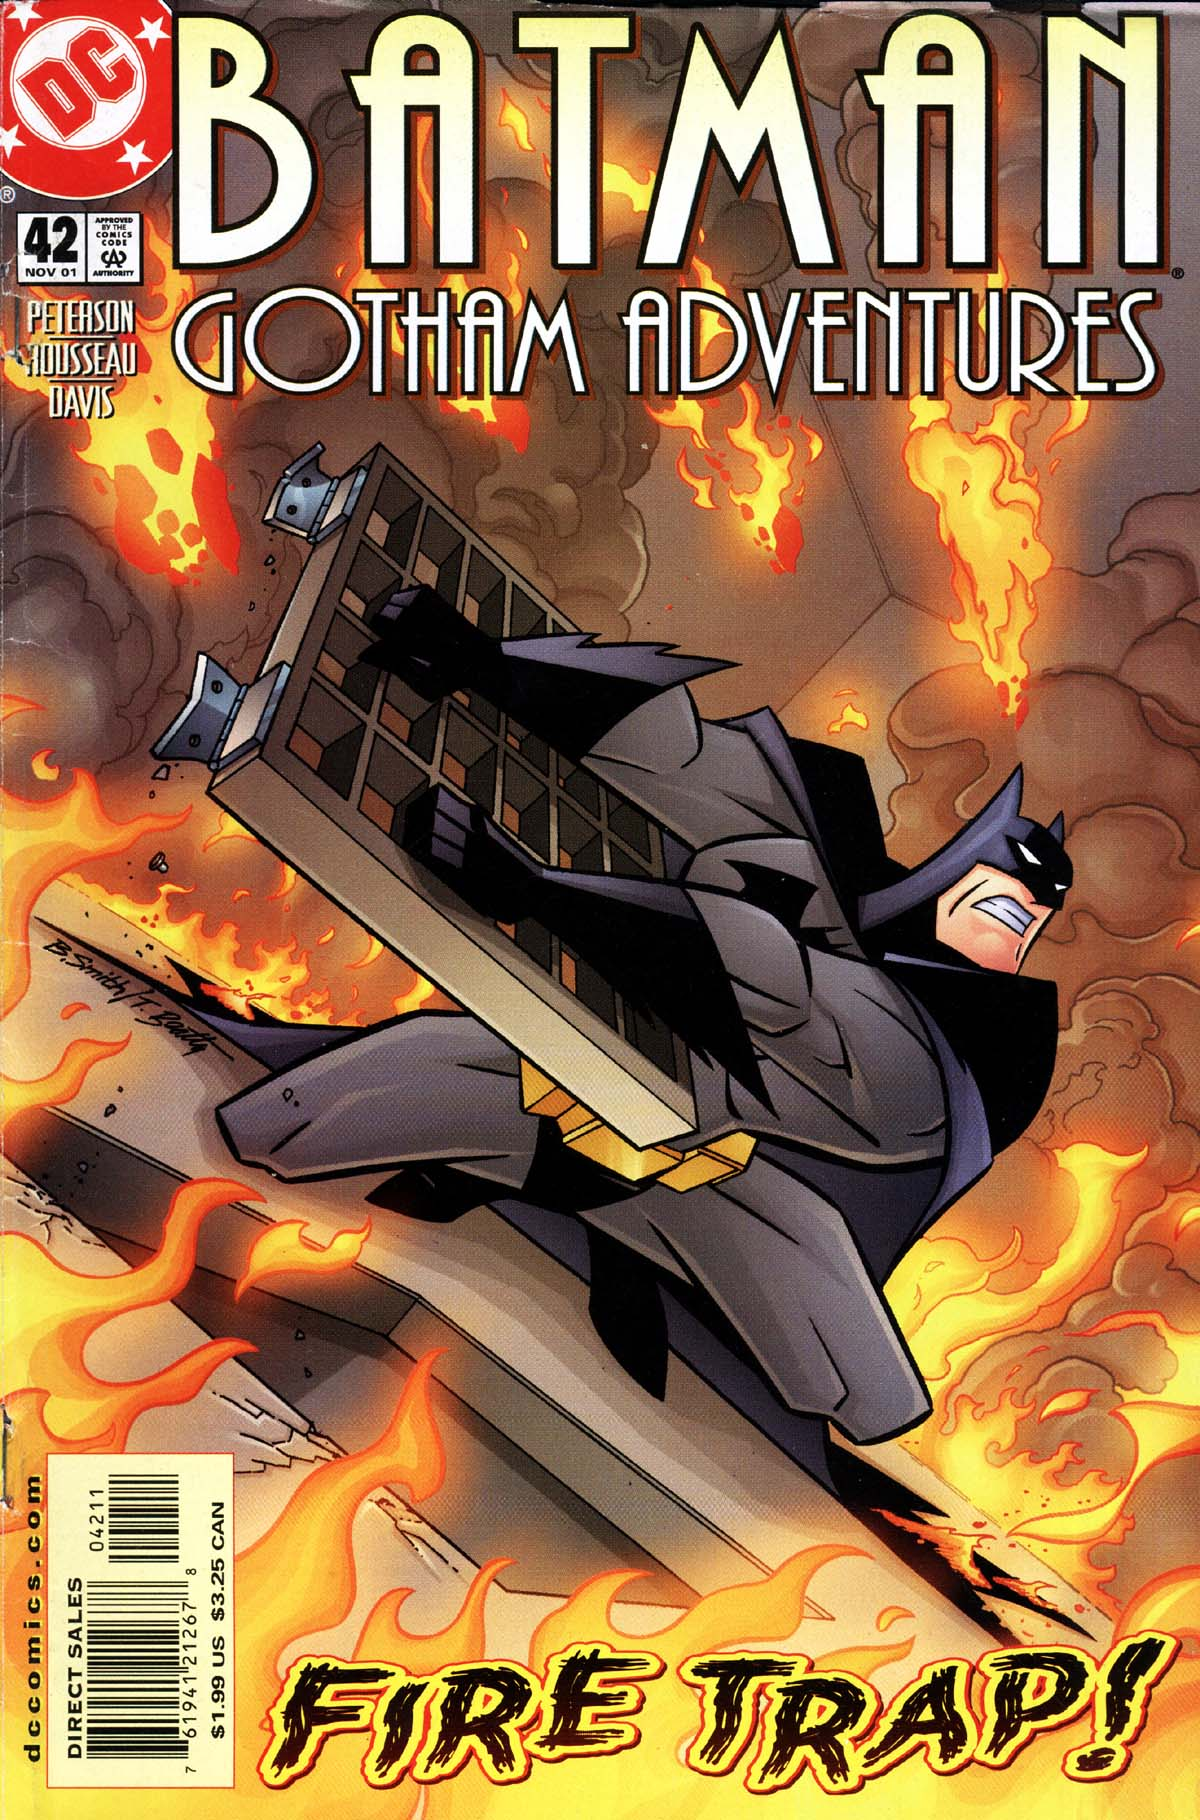 Batman: Gotham Adventures 42 Page 1